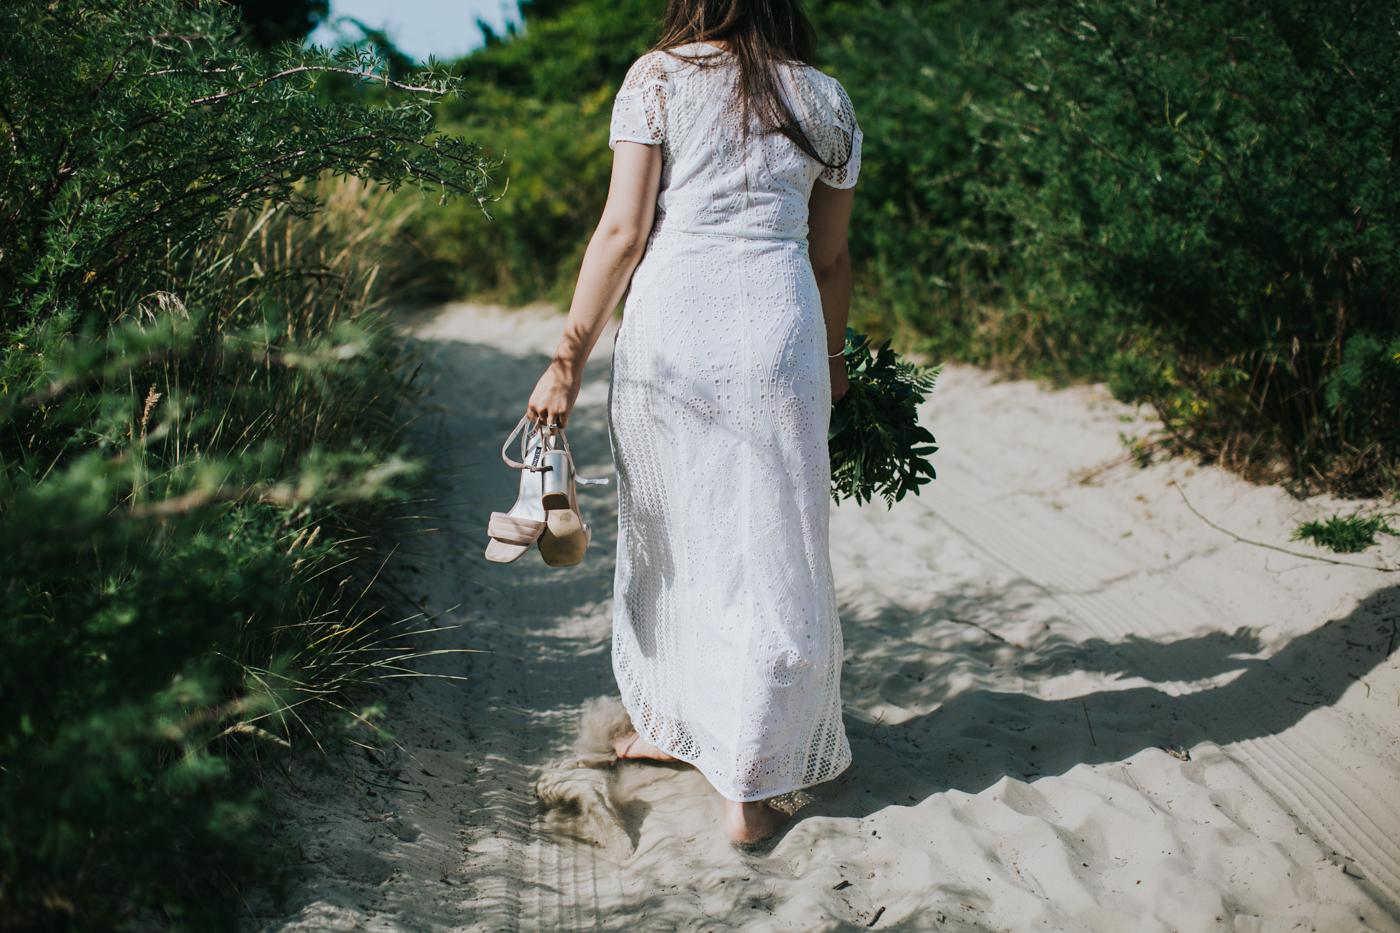 Ariana & Tim - Dunedin, New Zealand Wedding - Destination Wedding - Samantha Heather Photography-115.jpg